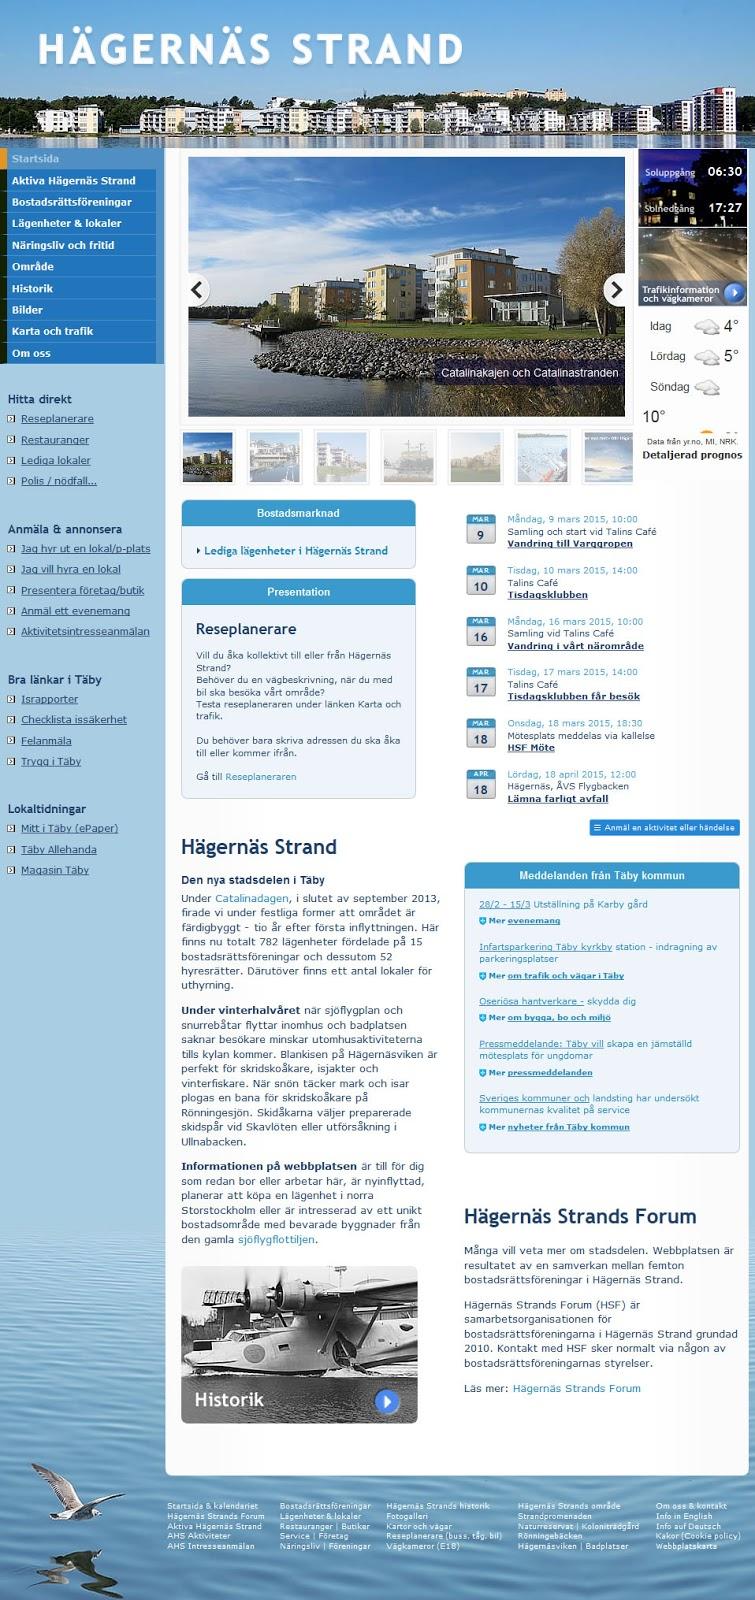 Hägernäs Strands startsida 2015-03-06